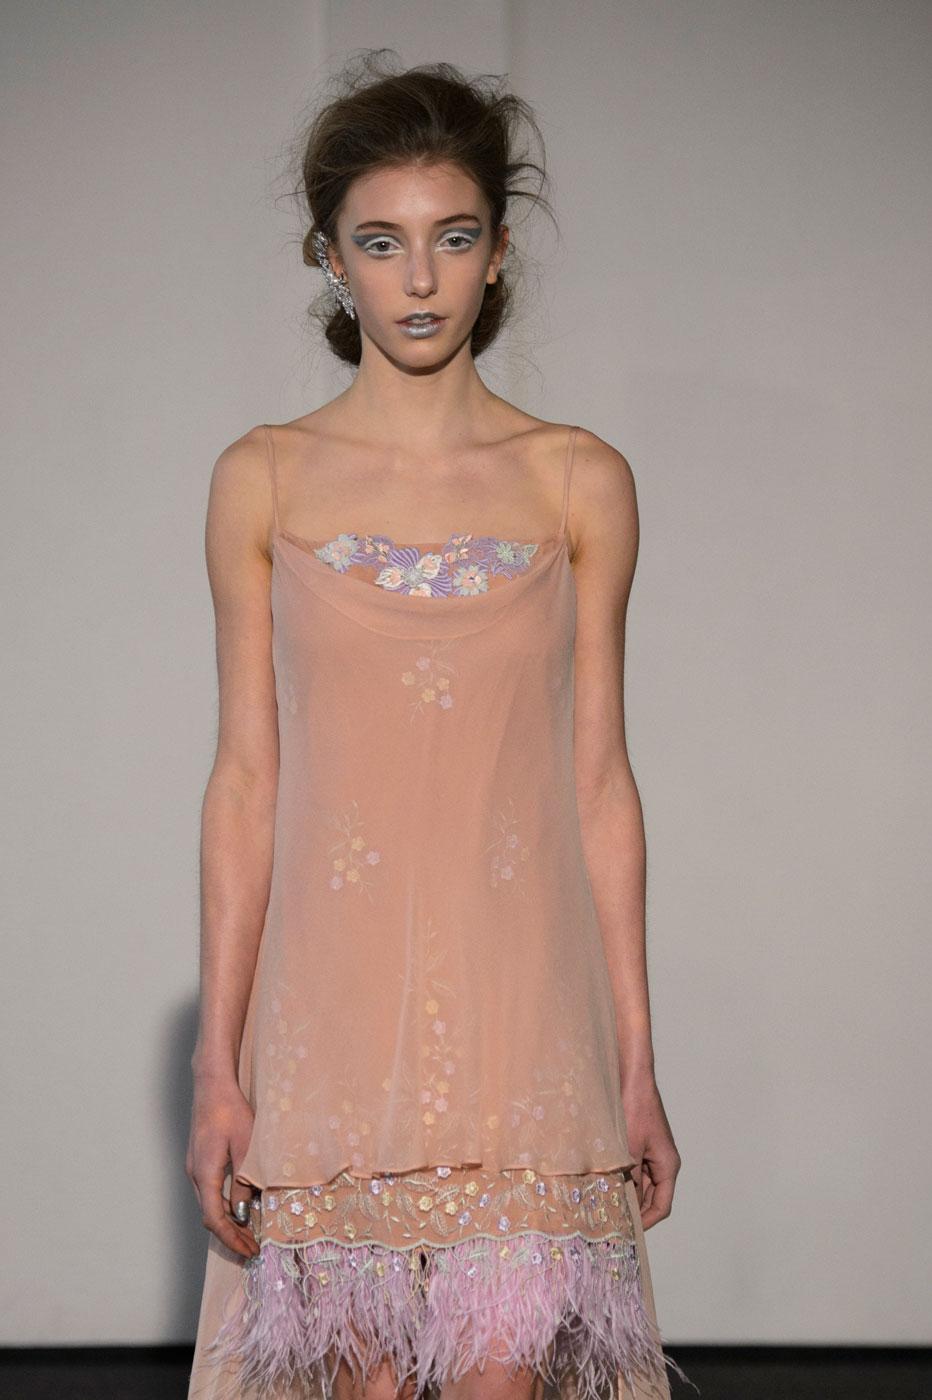 Busardi-fashion-runway-show-haute-couture-paris-spring-2015-the-impression-32